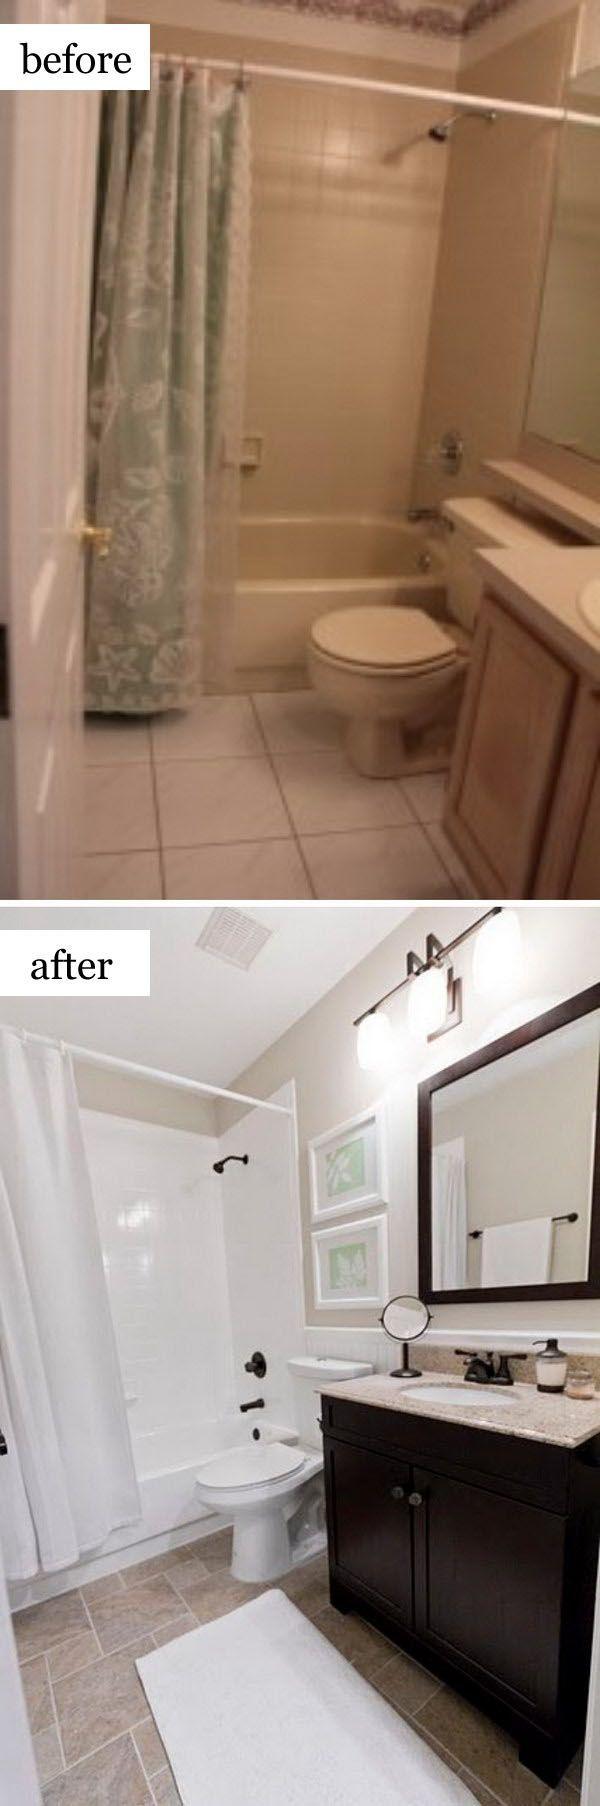 Inspirational Bathroom Remodel Ideas On A Budget